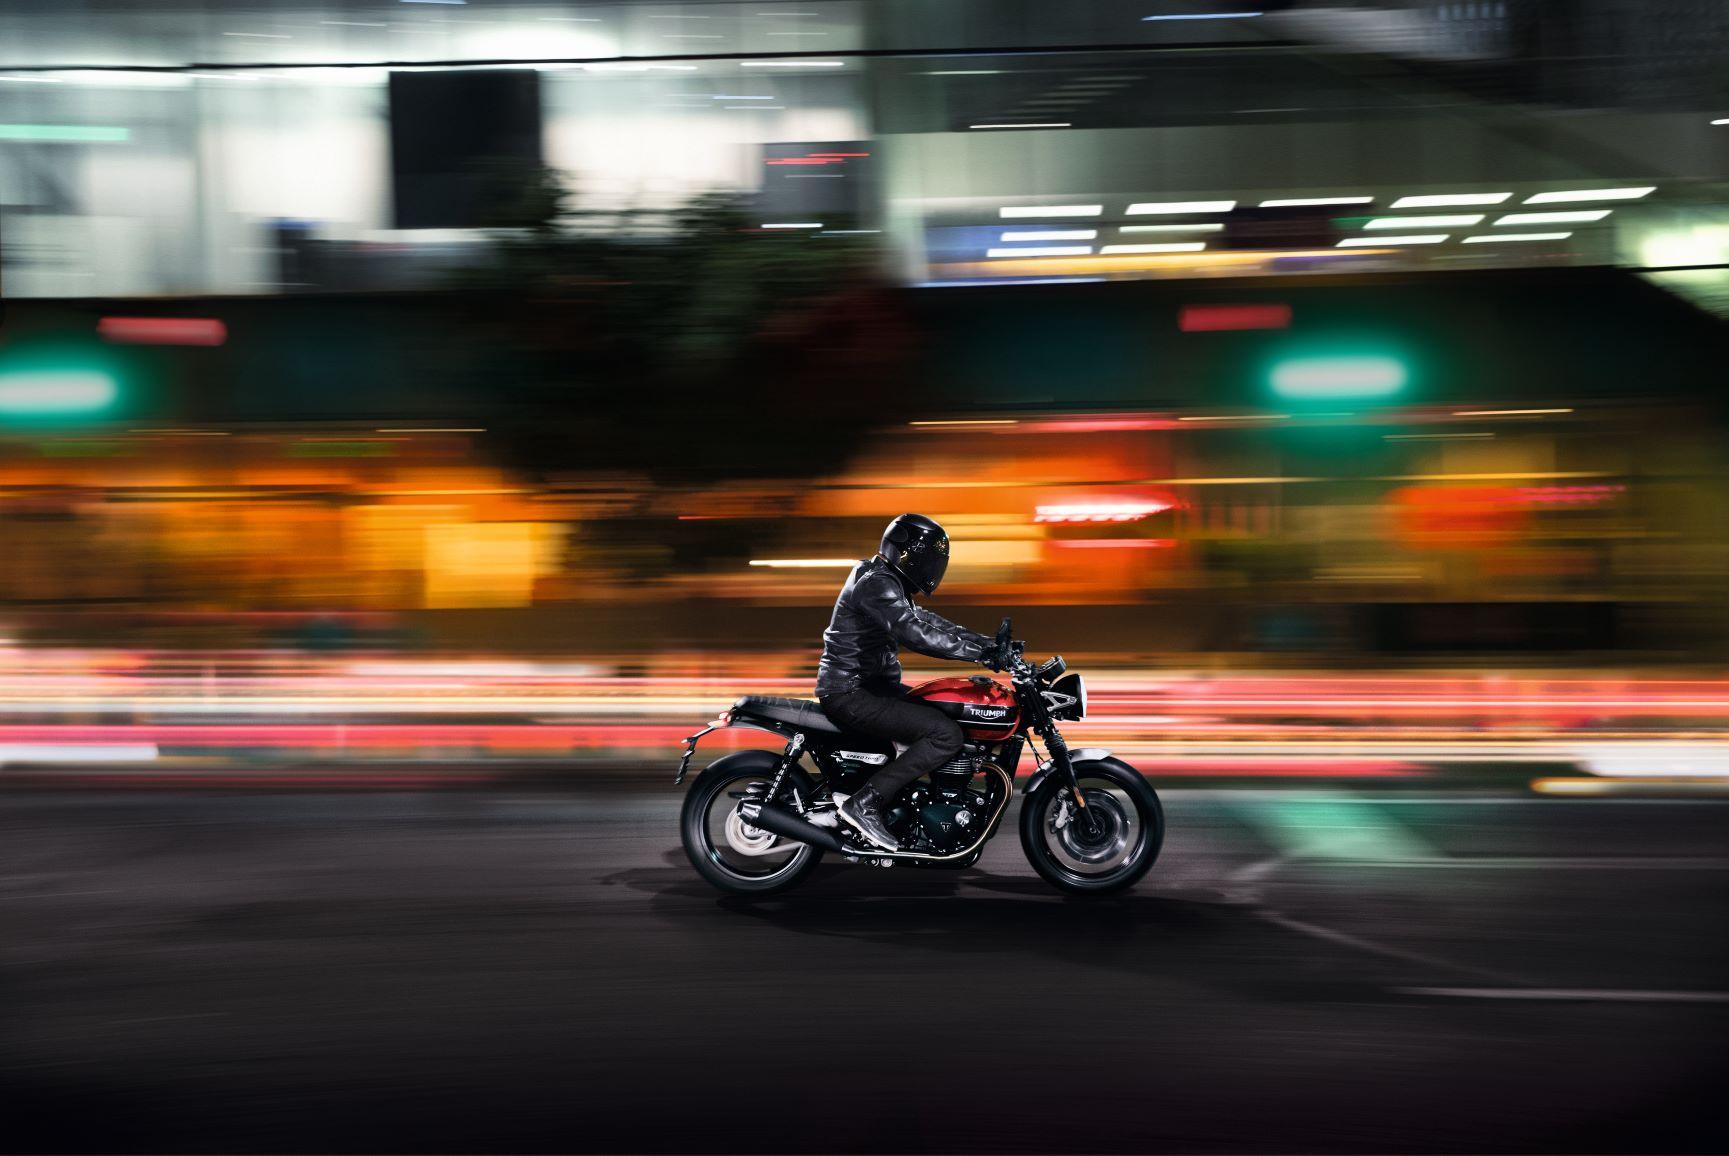 2019 Triumph Bonneville Speed Twin Motorcycle A Familiar Modern